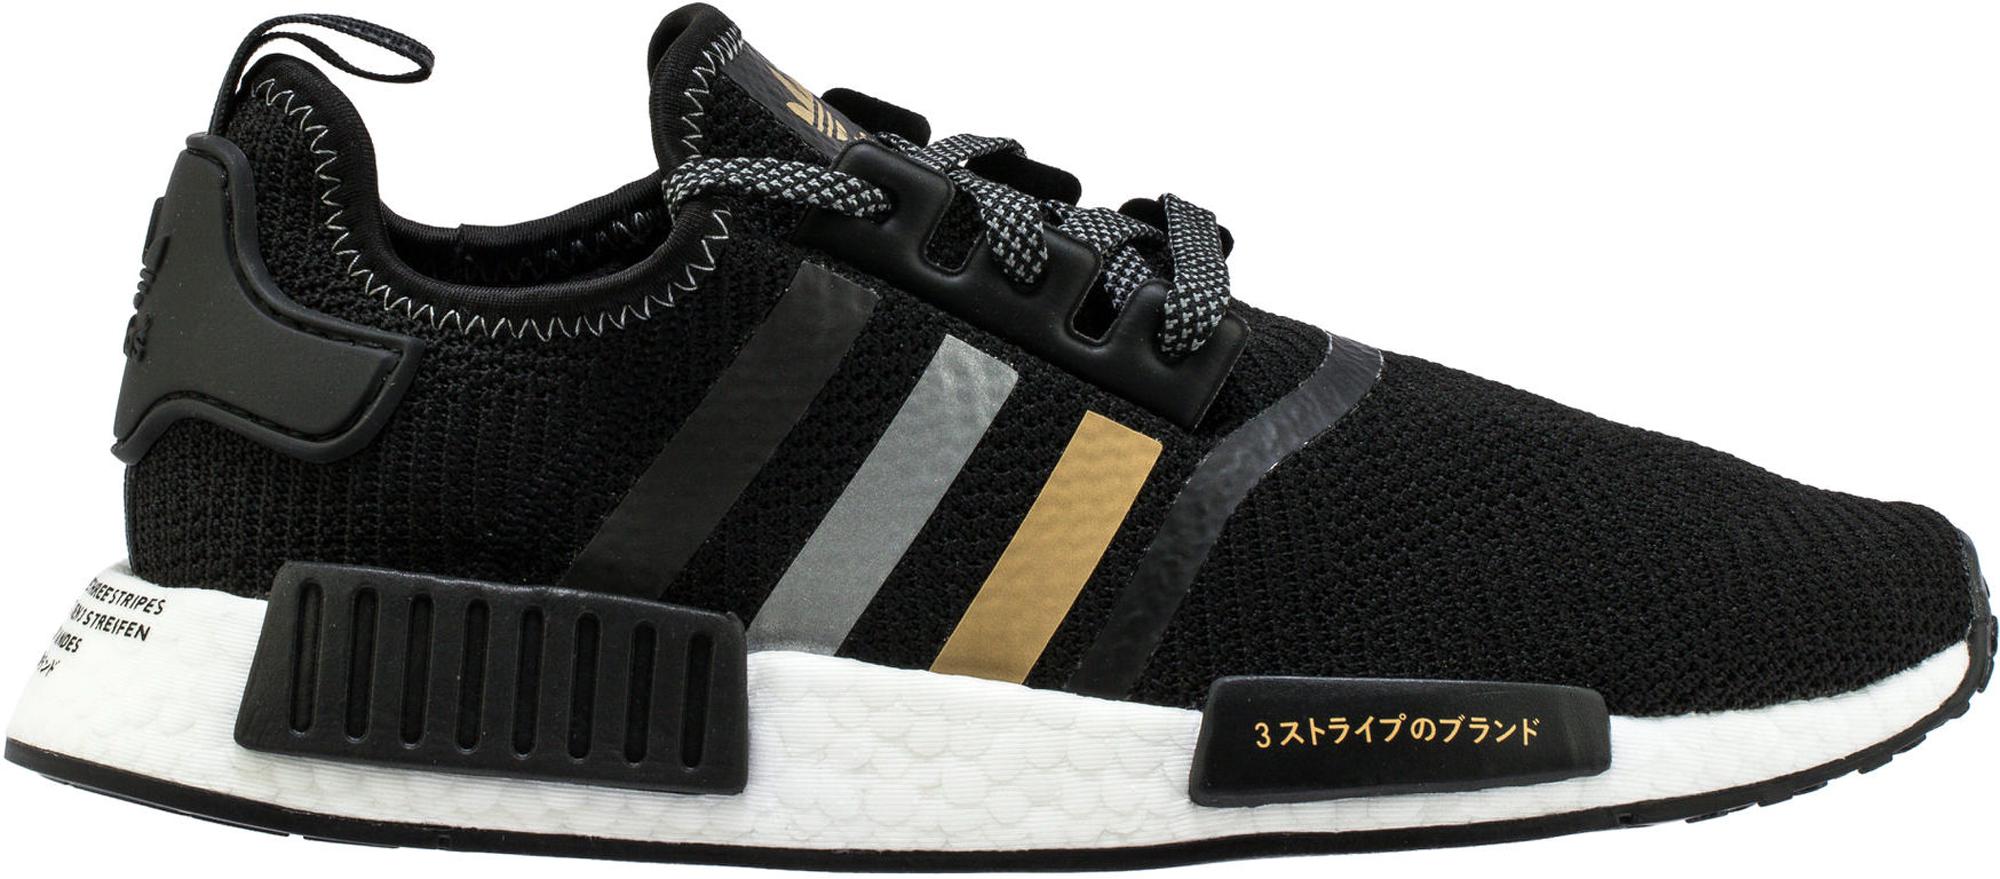 Pre Owned Adidas Originals Adidas Nmd R1 Shoe Palace Black And